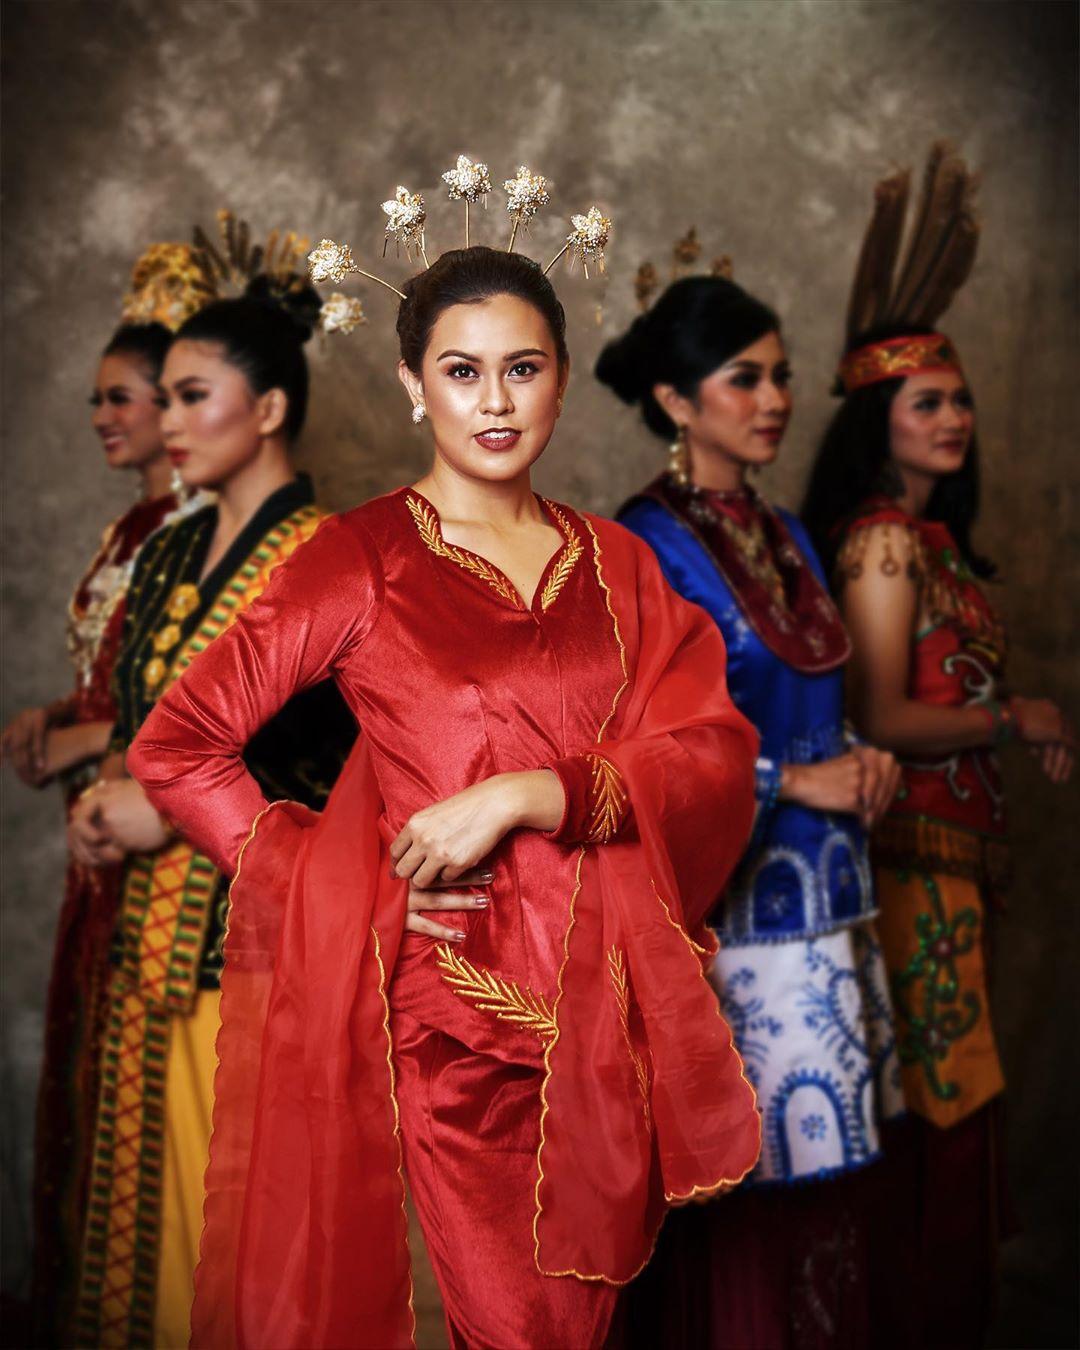 Baju adat Indonesia - Finalis Puteri Indonesia asal Sulawesi Utara 2